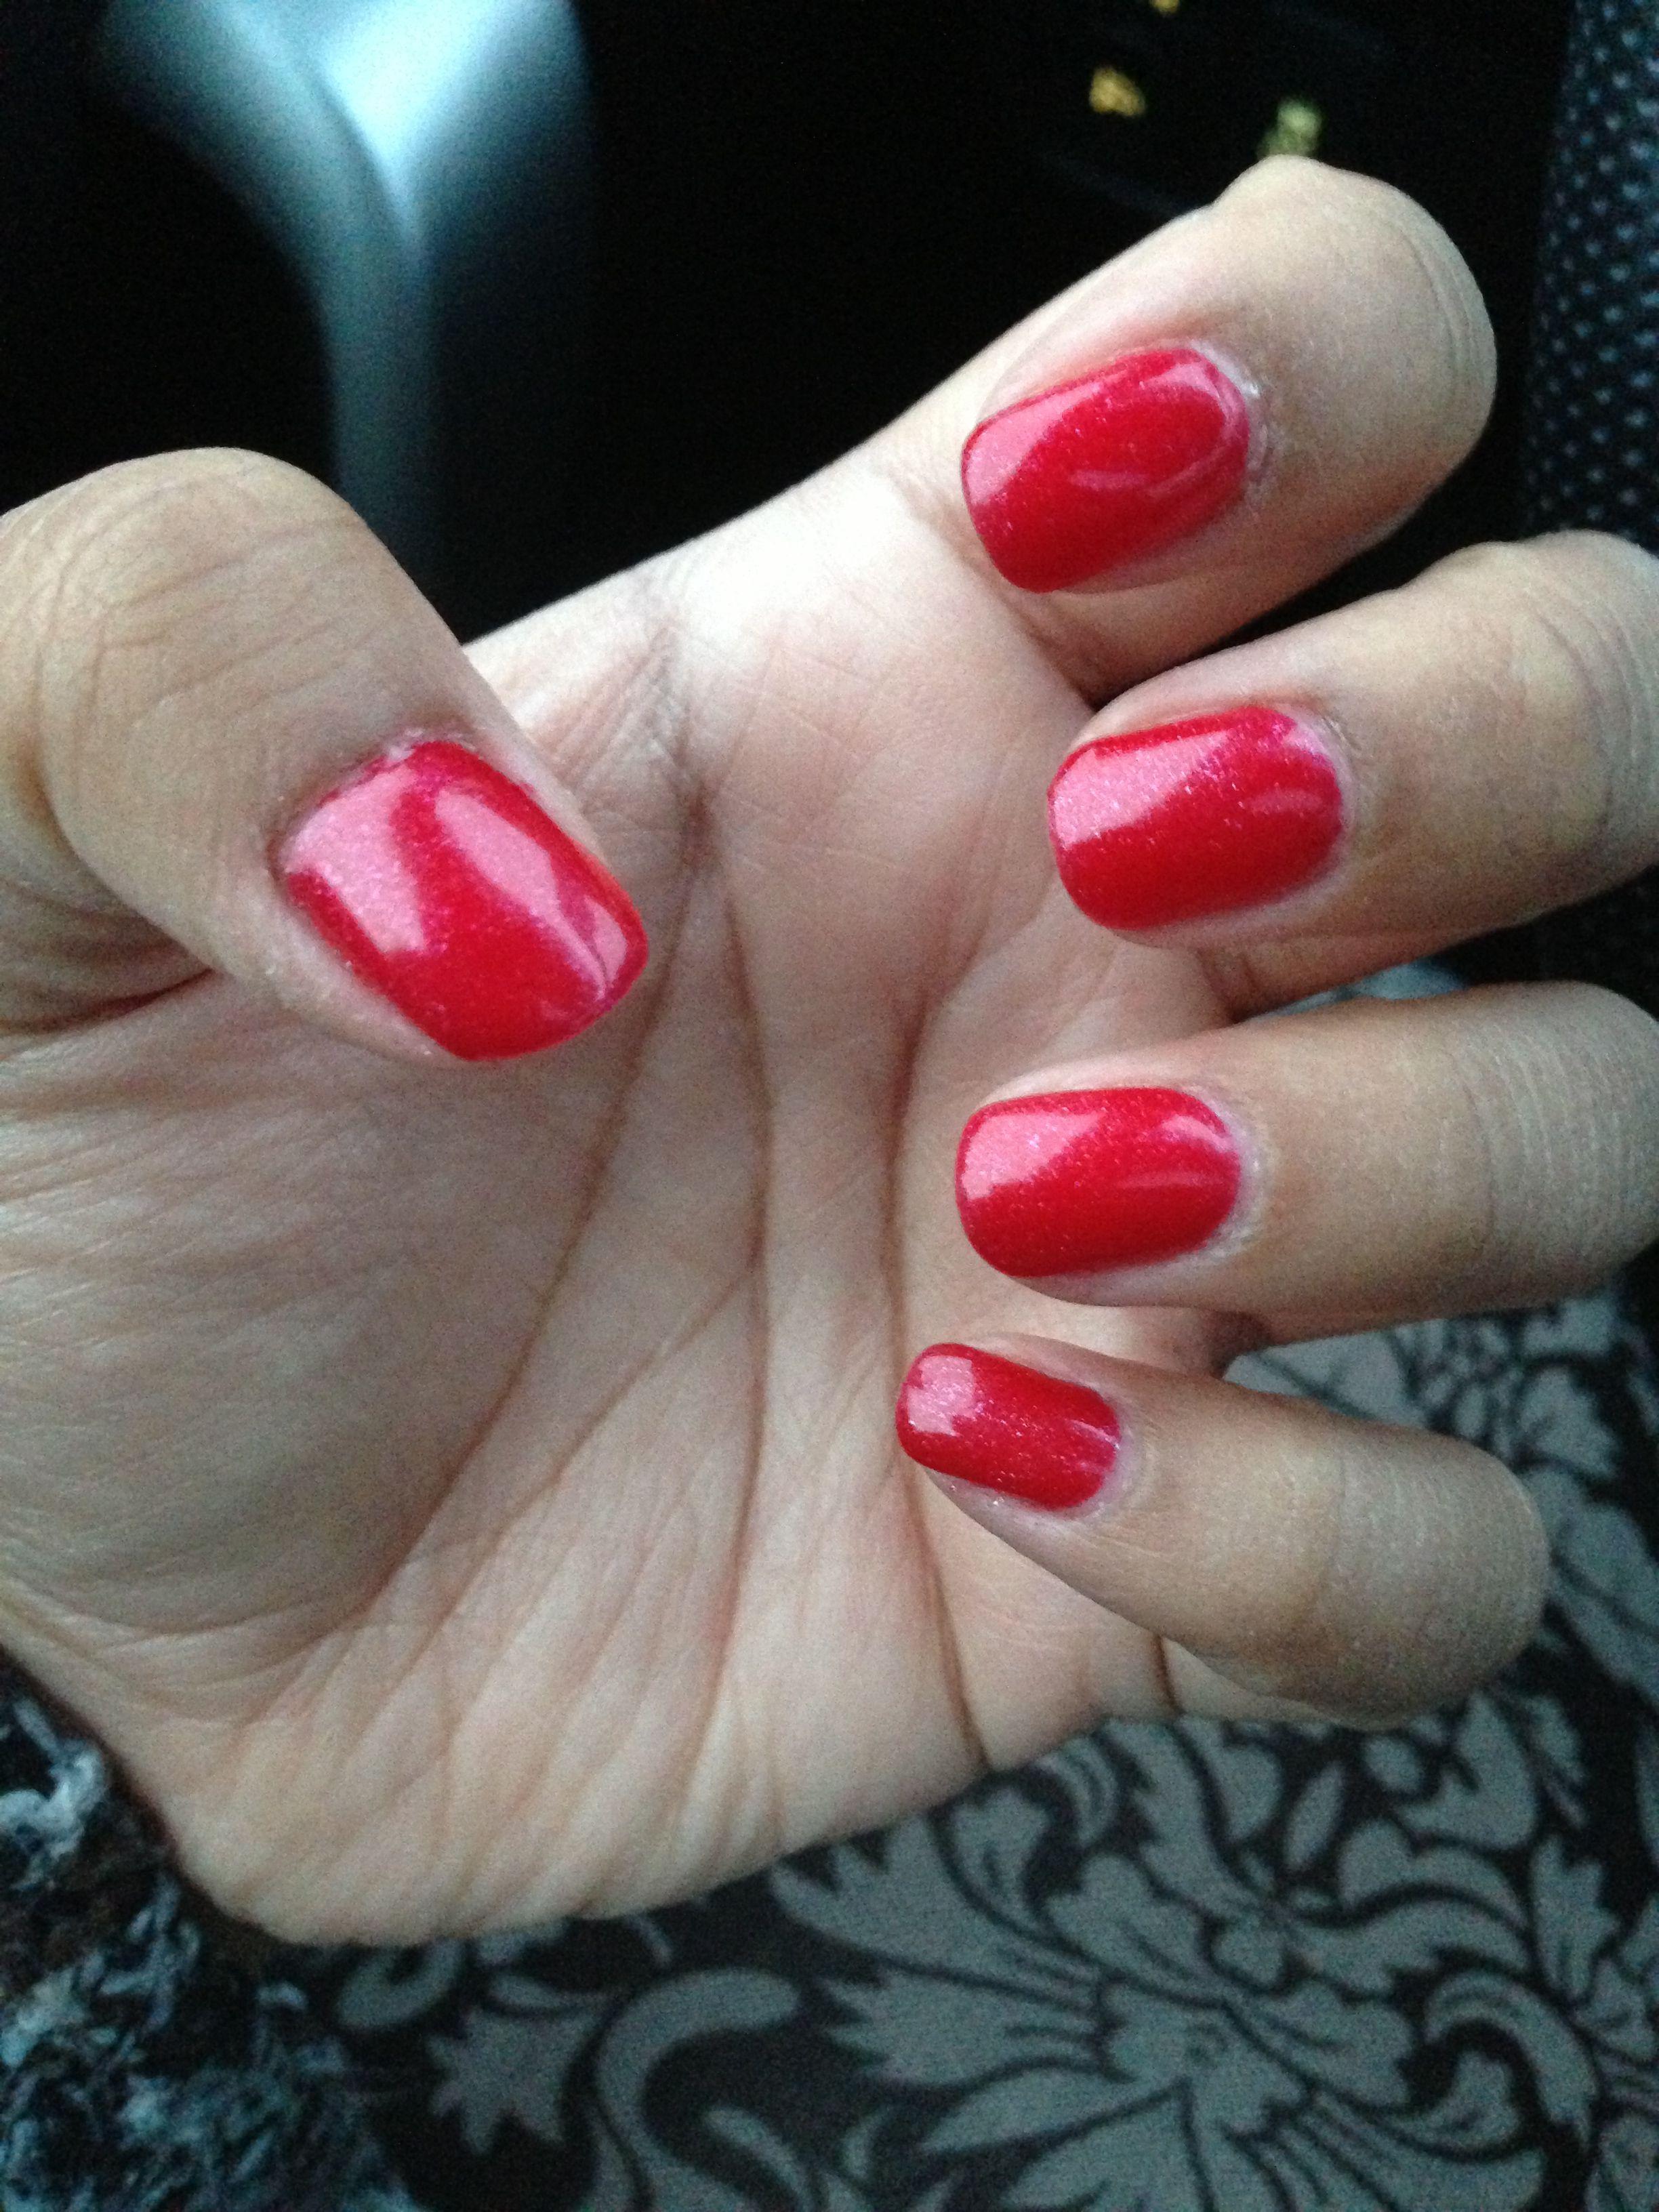 Diy gel nails without uv light